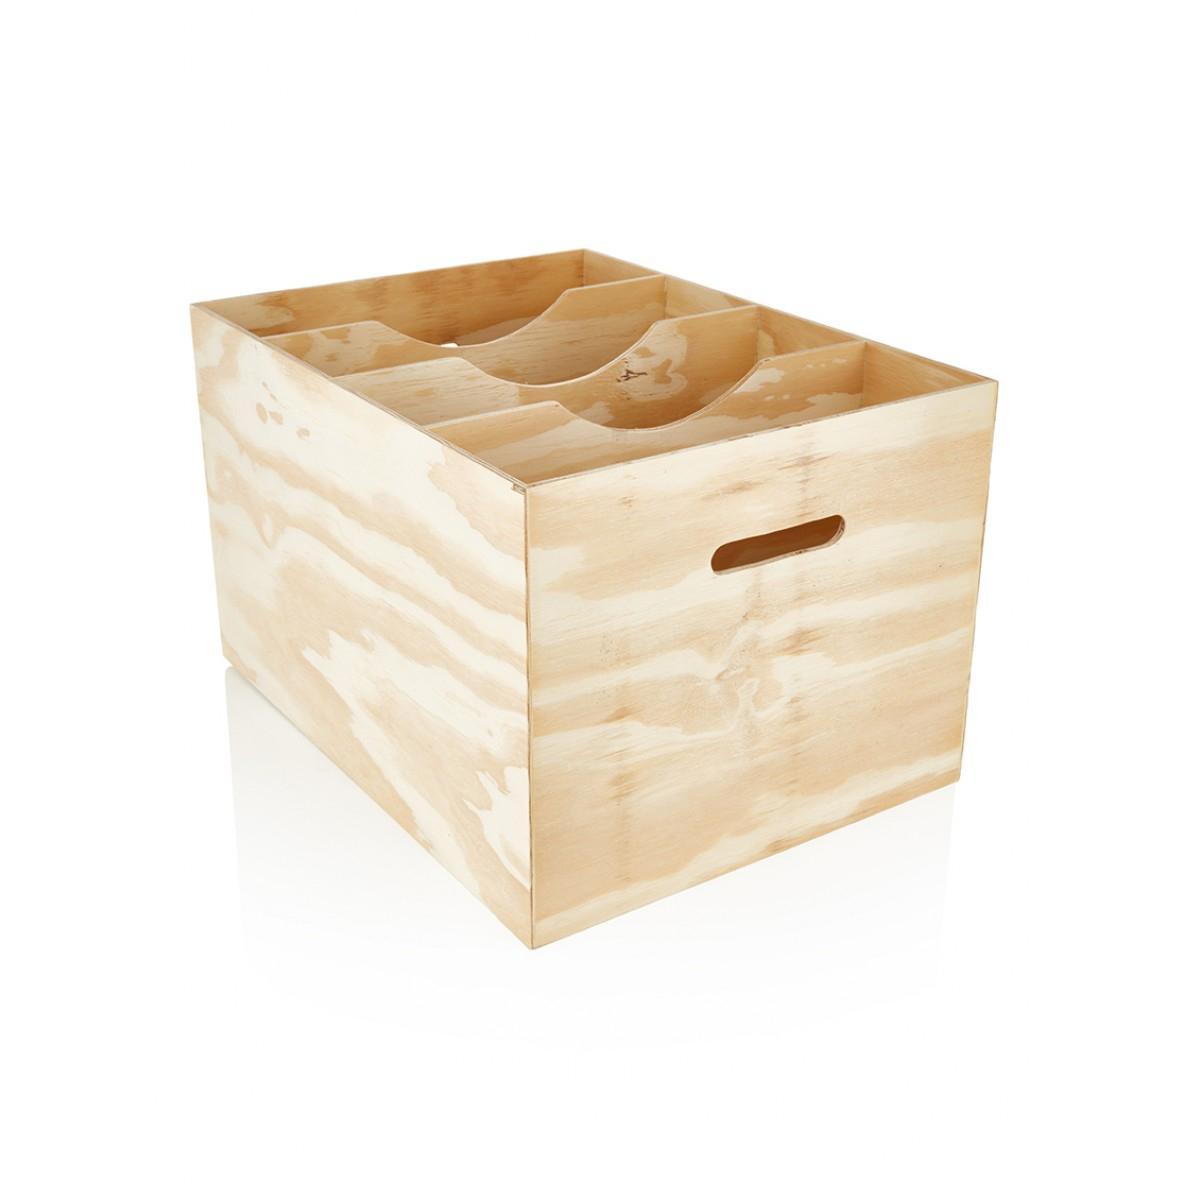 Arch Lever File Box - No Lid - Natural